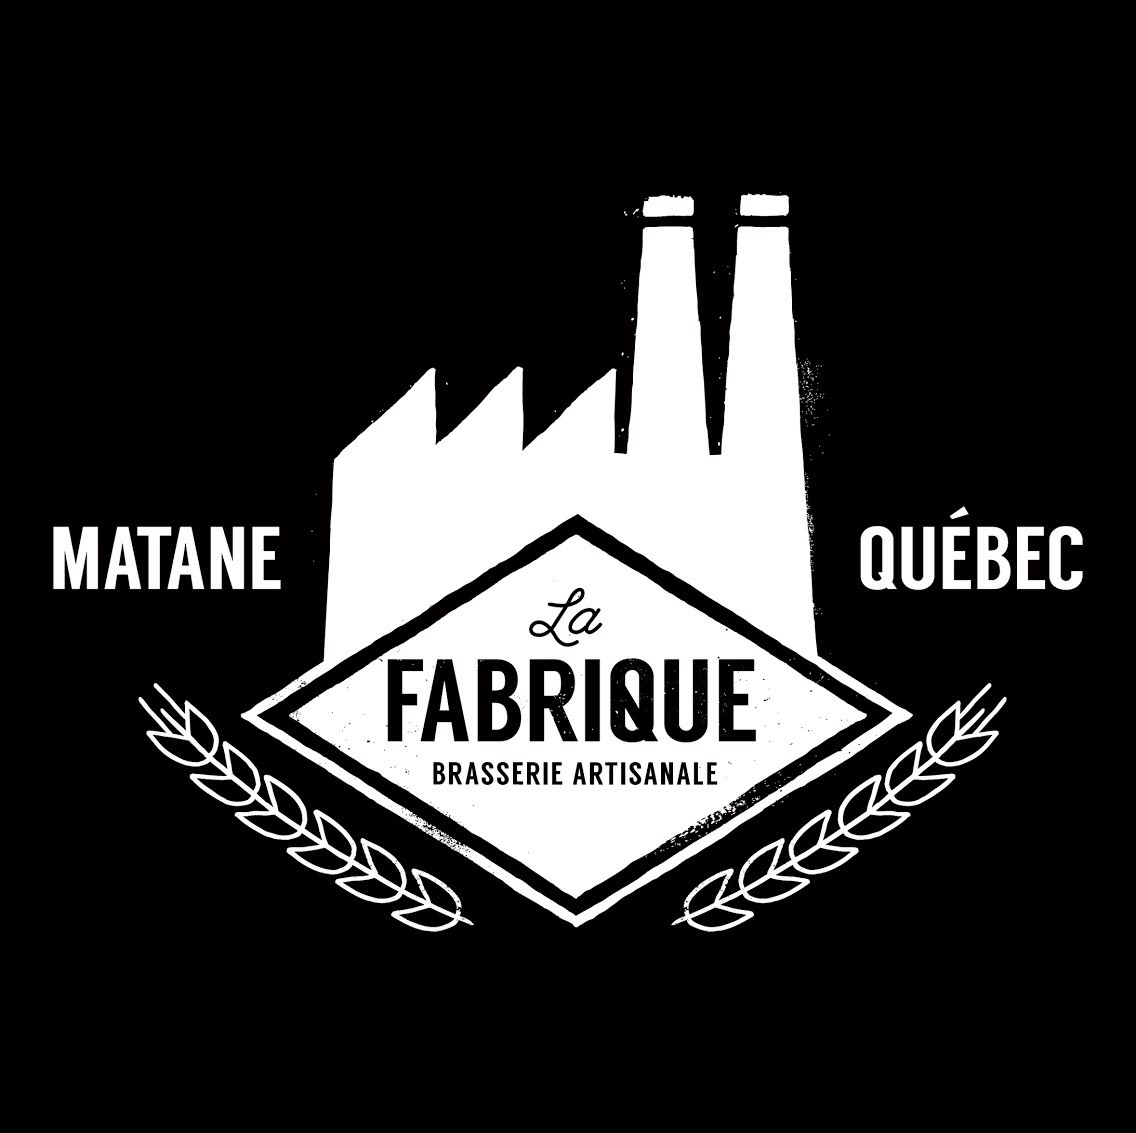 La Fabrique Brasserie Artisanale